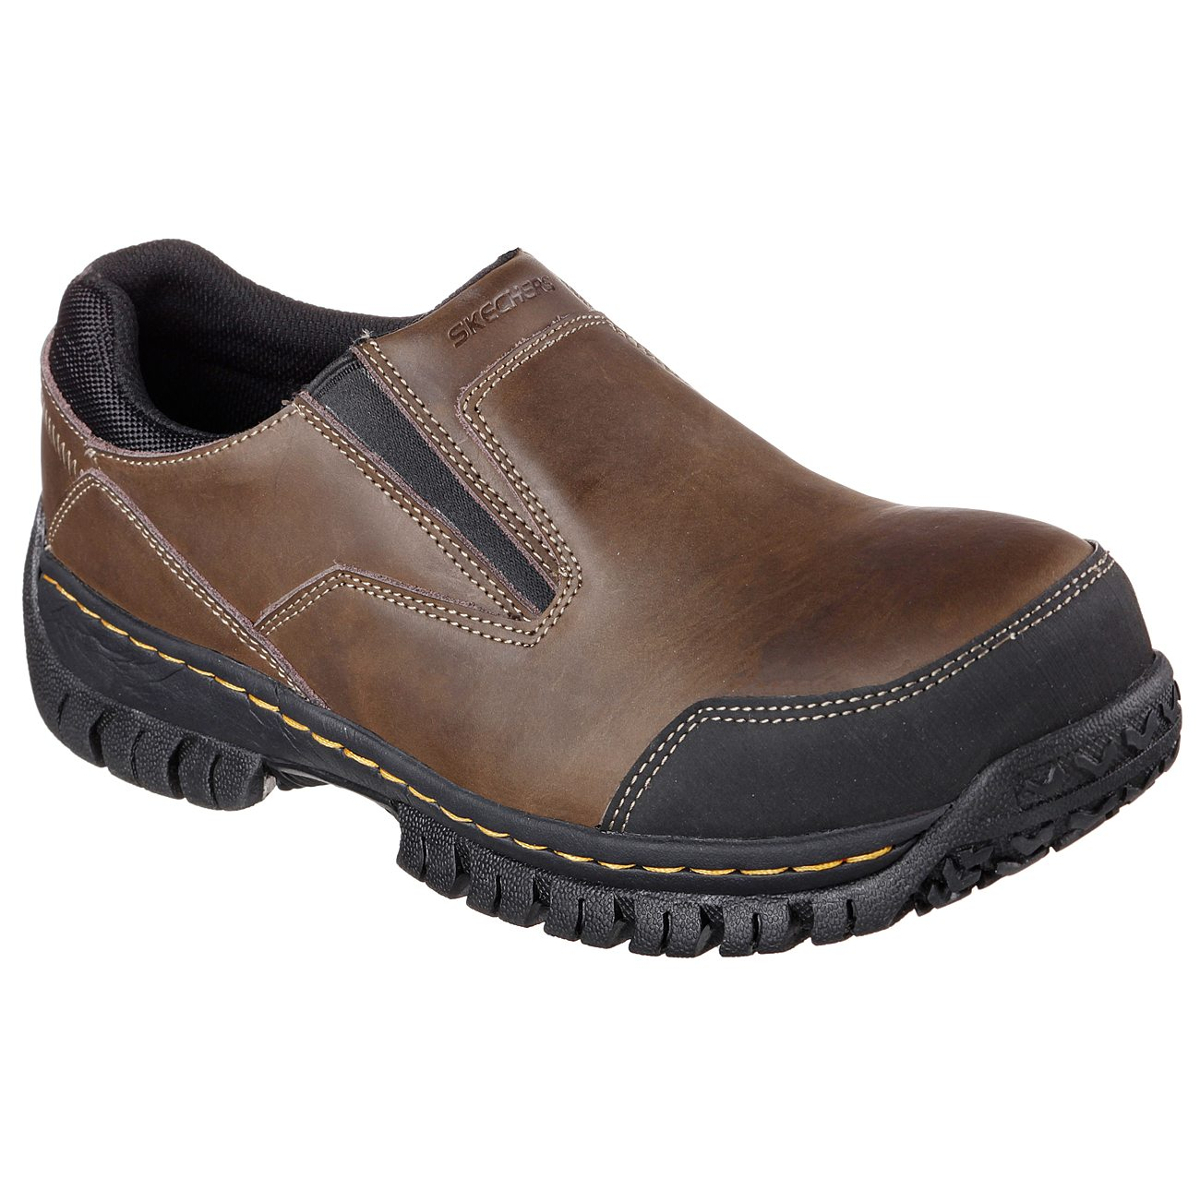 Skechers Men's Work Relaxed Fit: Hartan Steel Toe Work Shoes - Brown, 9